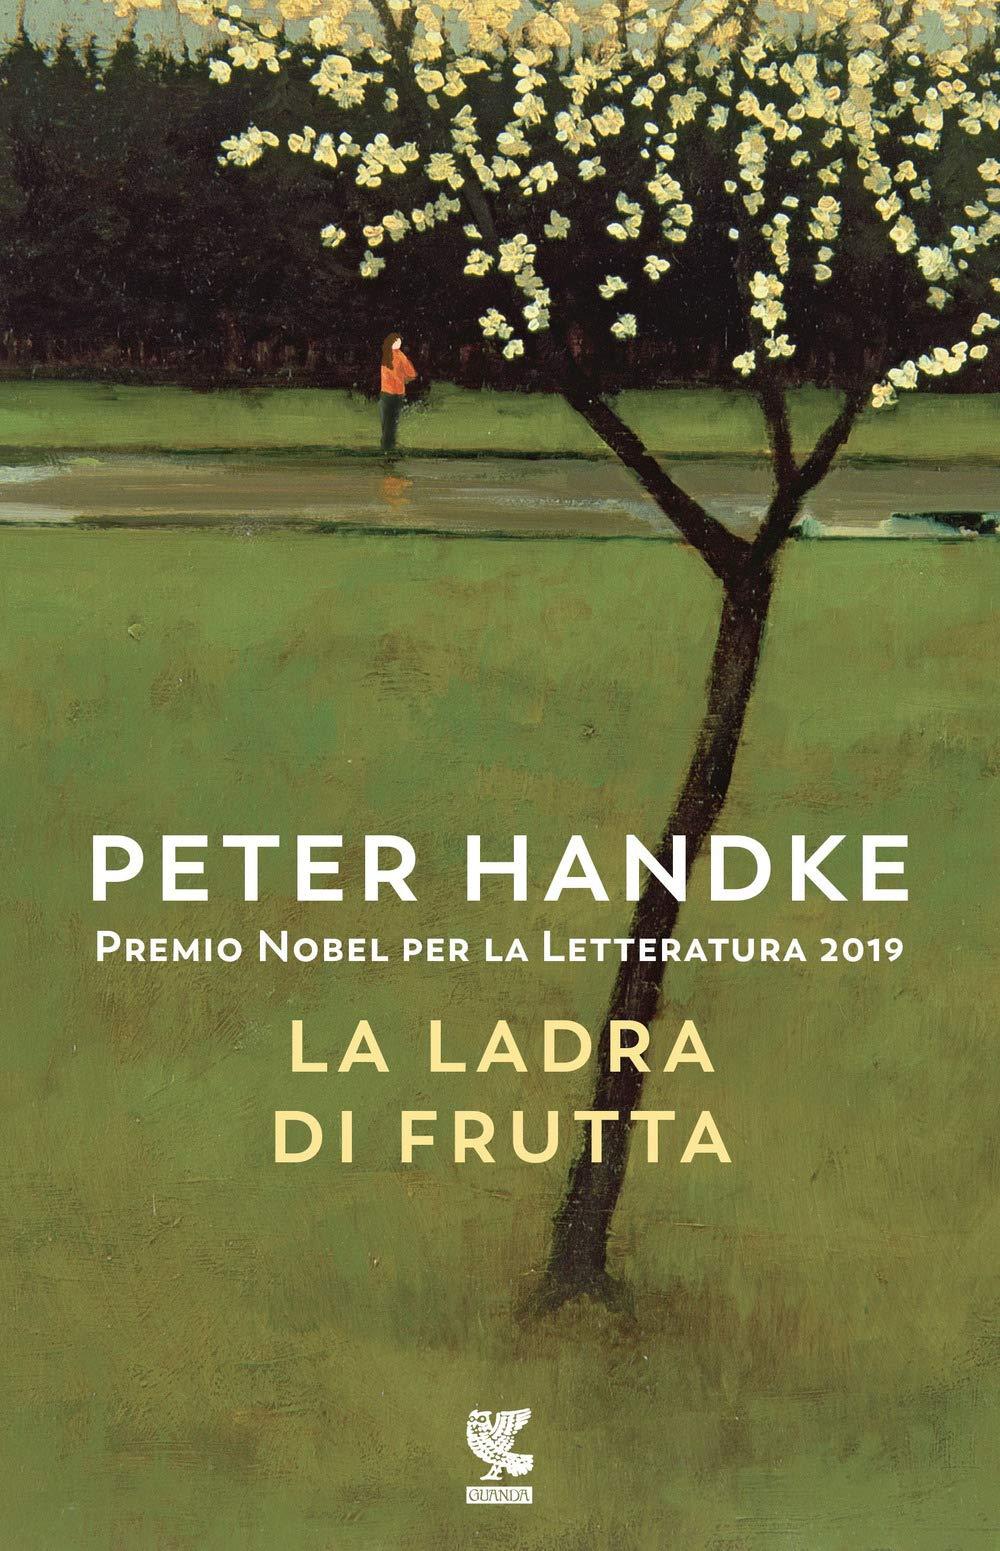 La ladra di frutta (Narratori della Fenice): Amazon.es: Handke, Peter, Iadicicco, A.: Libros en idiomas extranjeros